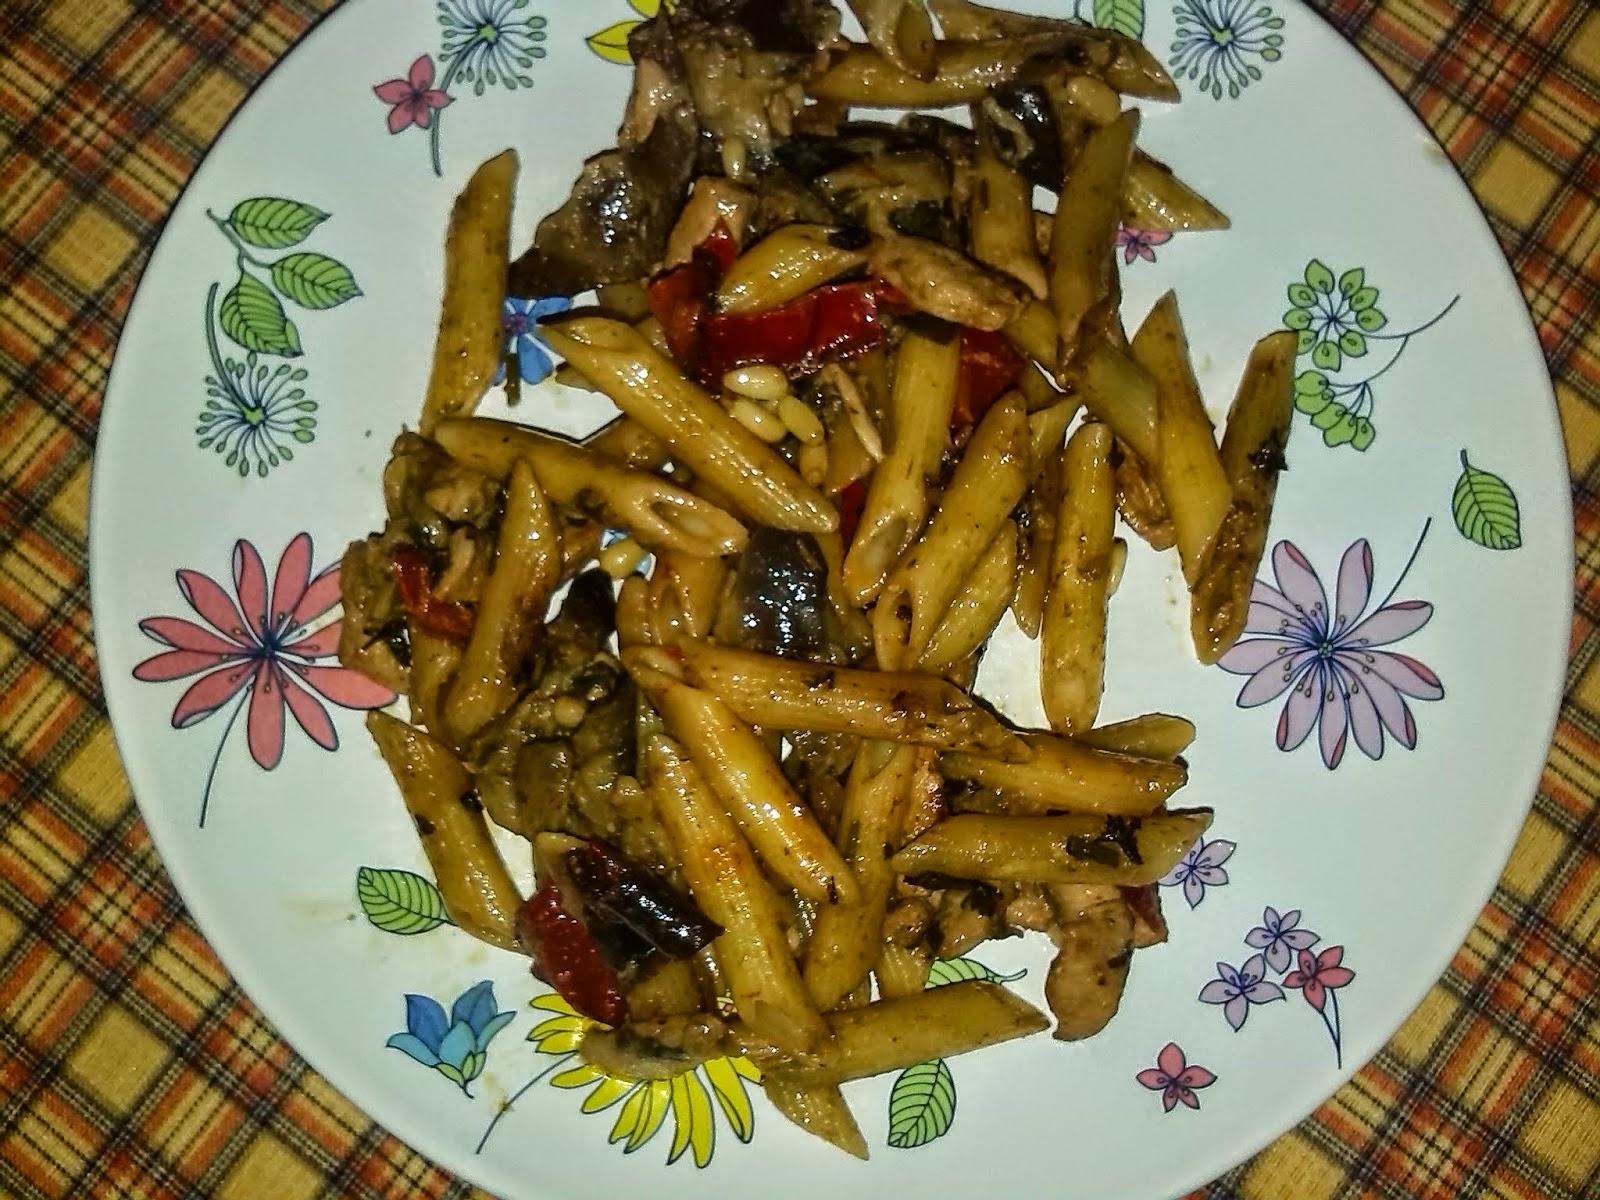 http://lashermanasyunamarx.blogspot.com.es/2014/04/pasta-con-pollo-thai.html